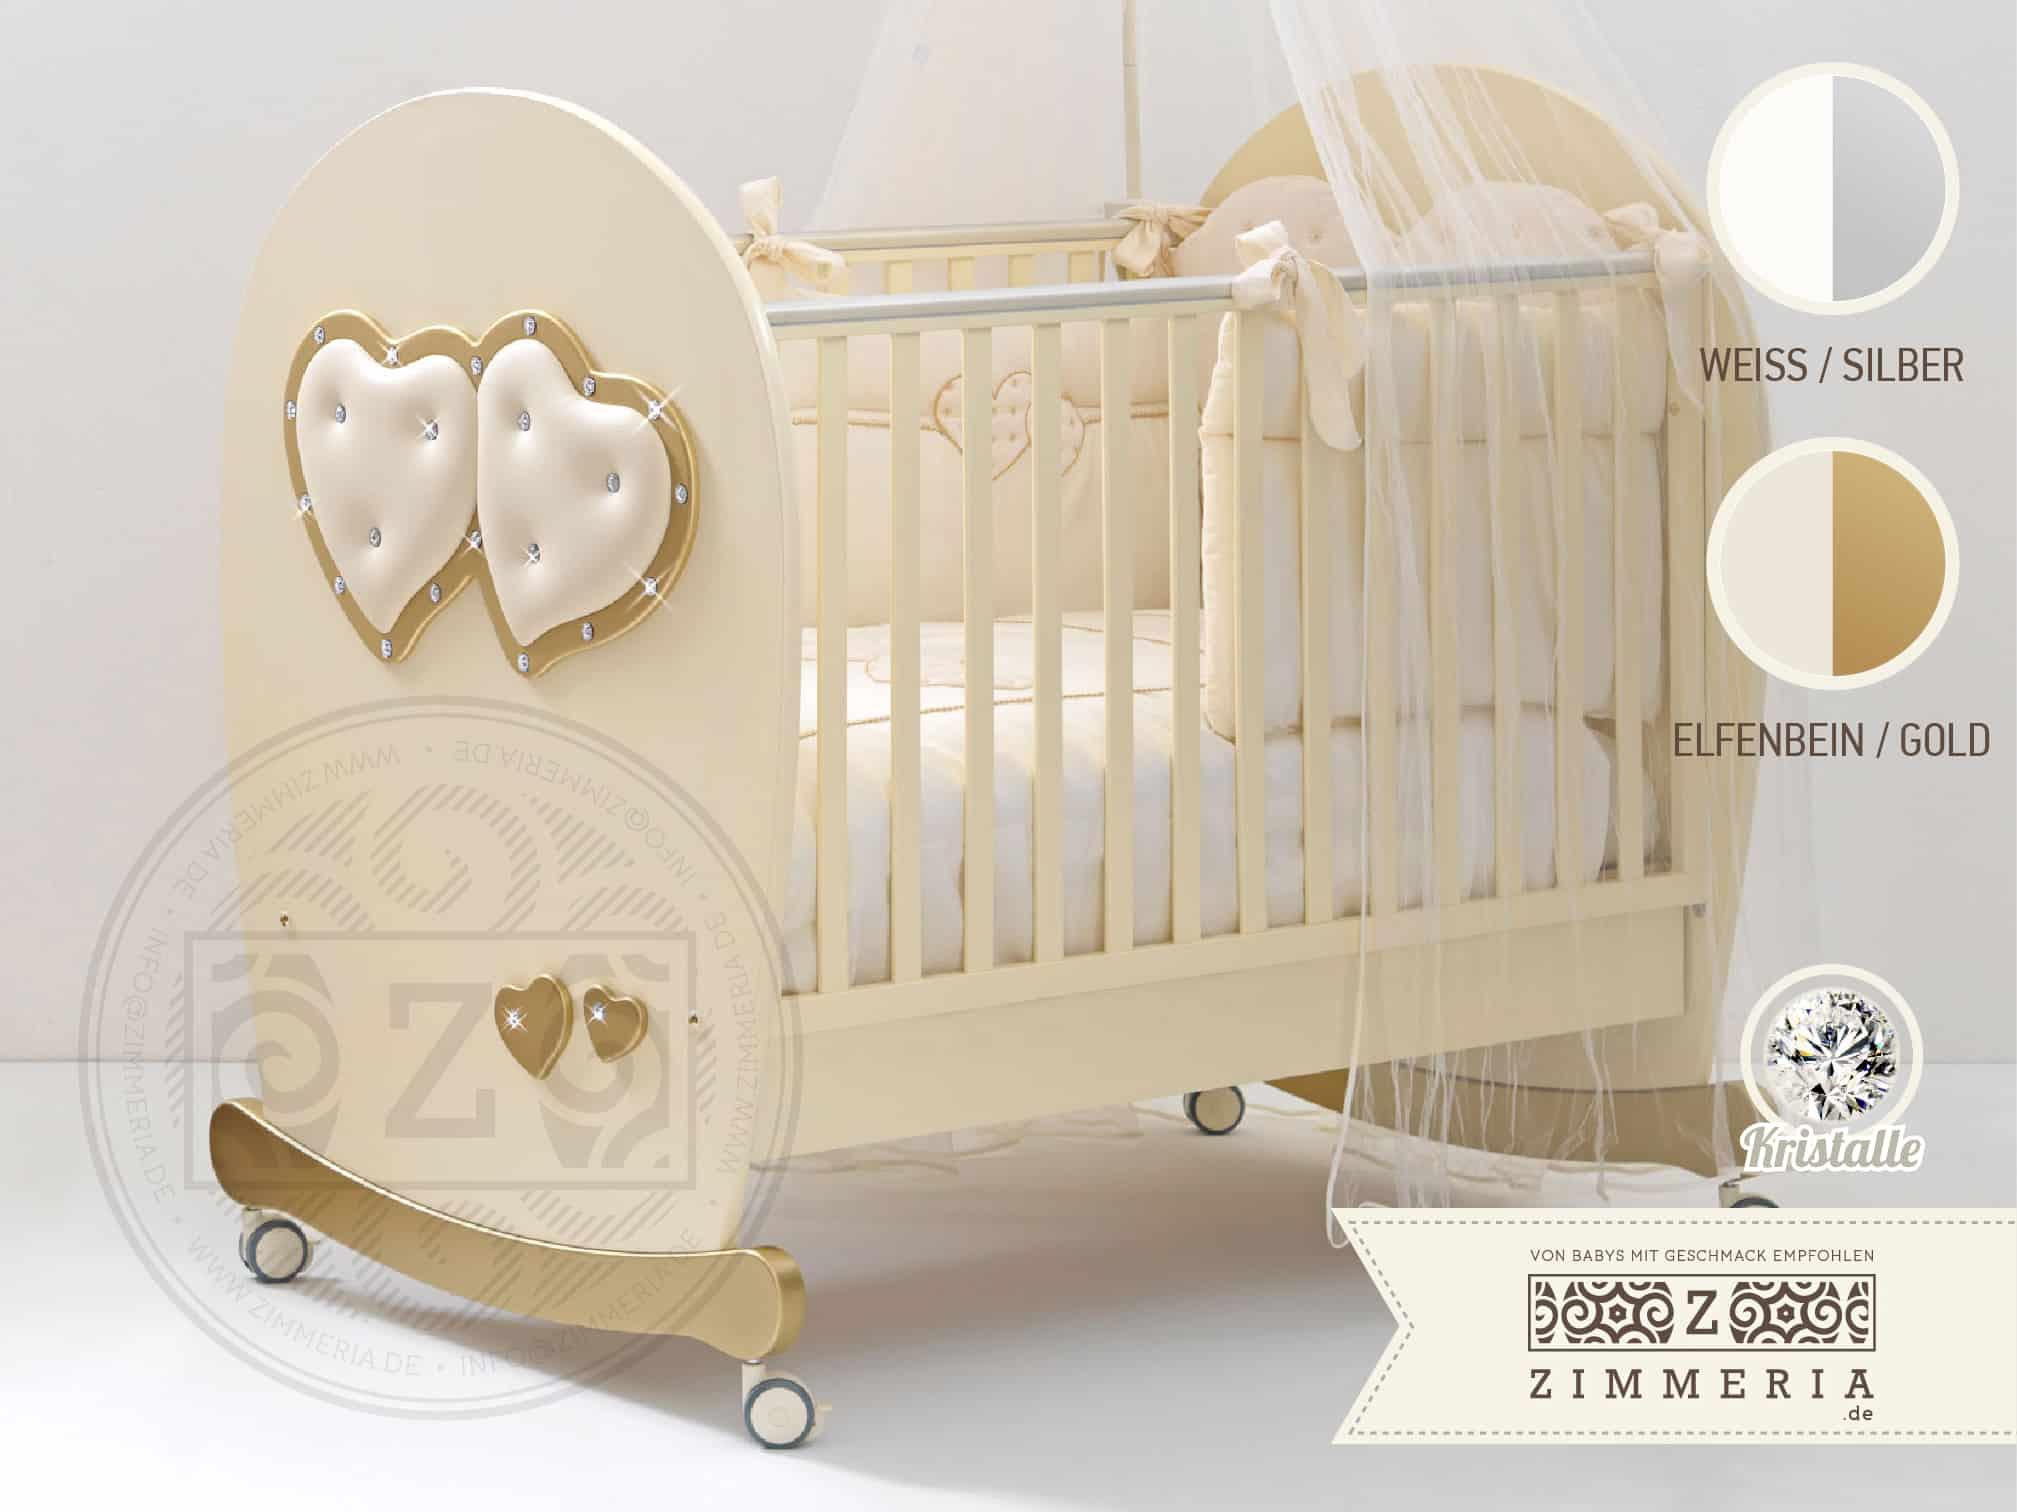 babybett bettkasten inspiration design familie traumhaus. Black Bedroom Furniture Sets. Home Design Ideas